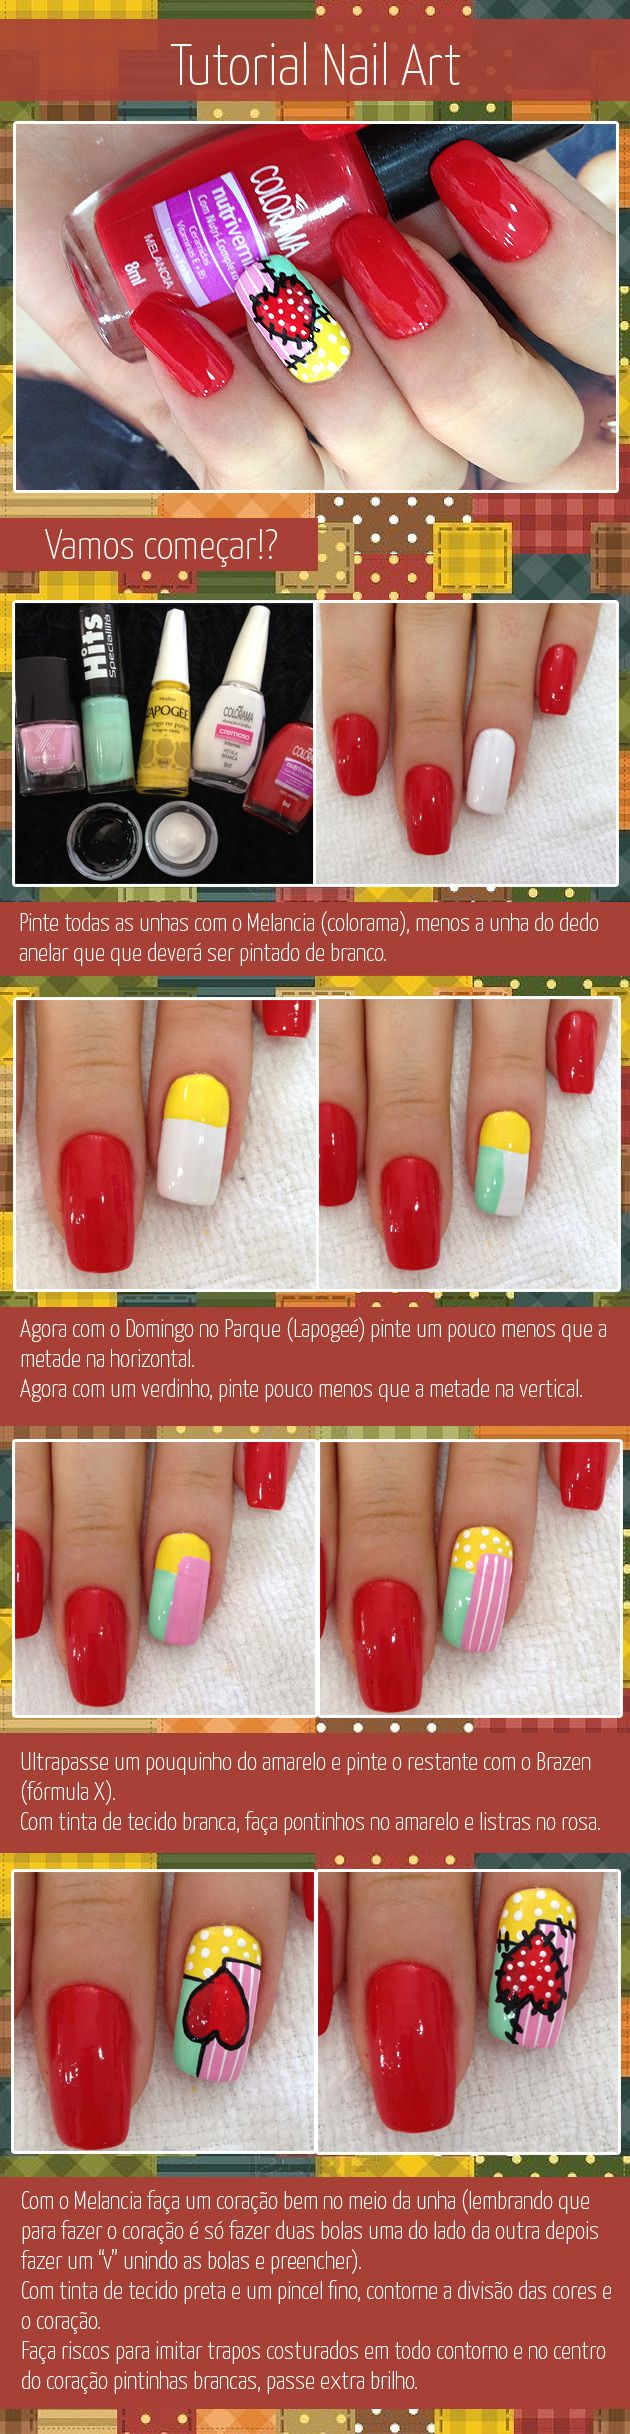 best nails images on pinterest nail scissors nail art designs